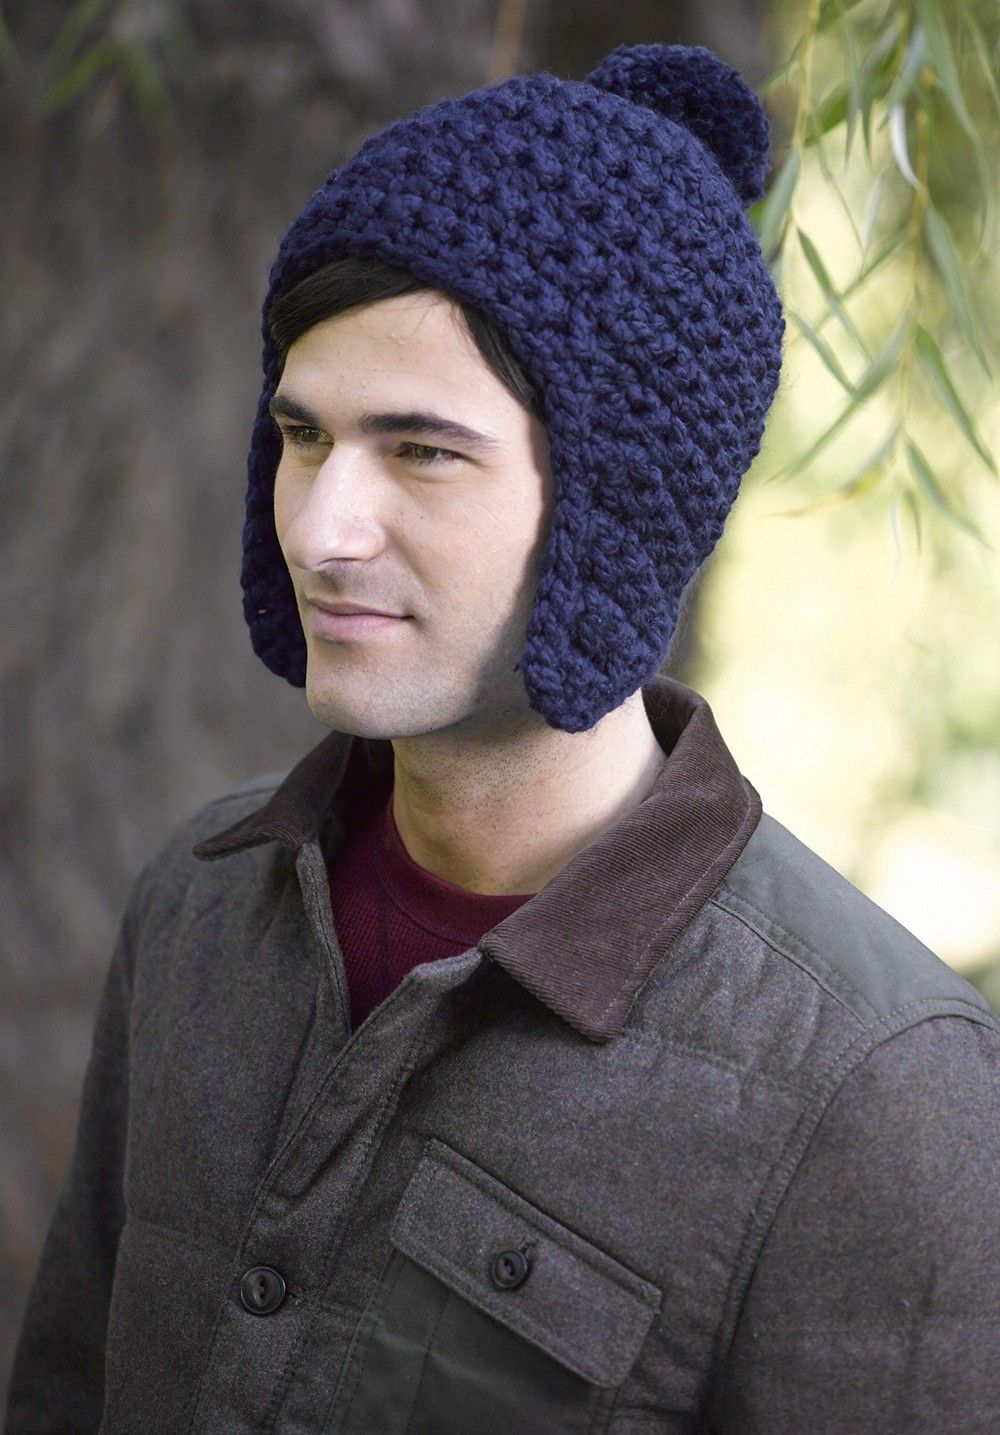 Toboggan Hat Pattern (Crochet) | hope | Pinterest | Crochet ...